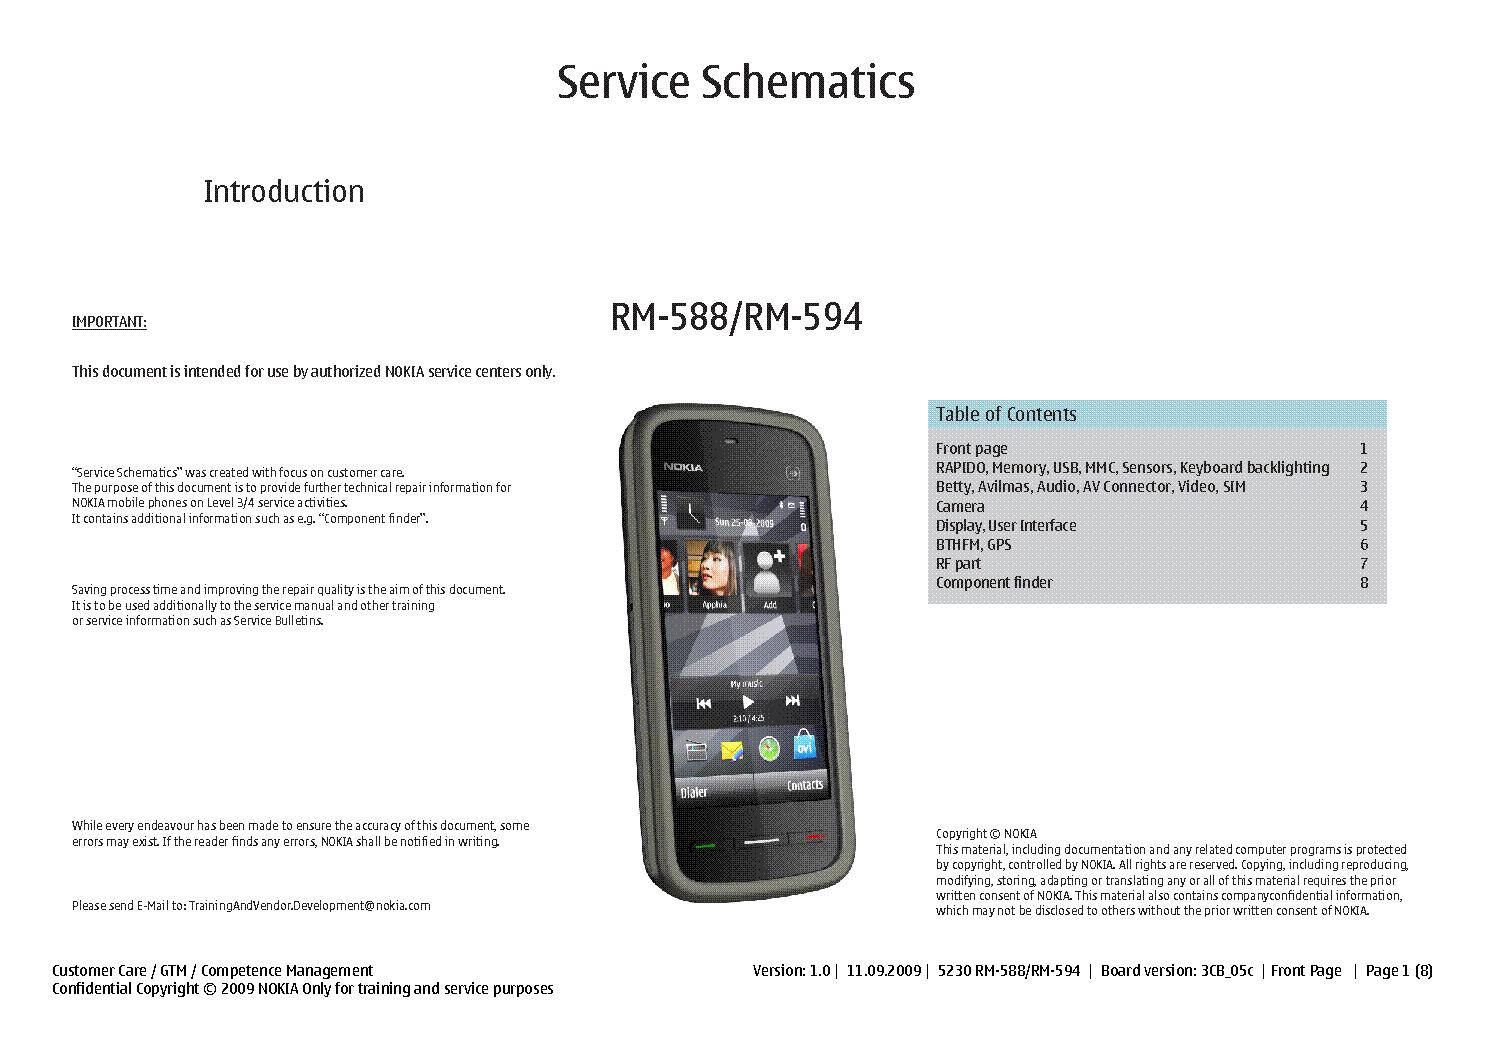 nokia 5230 rm 588 rm 594 schematics sch service manual download rh elektrotanya com Nokia 5320 Nokia 5210